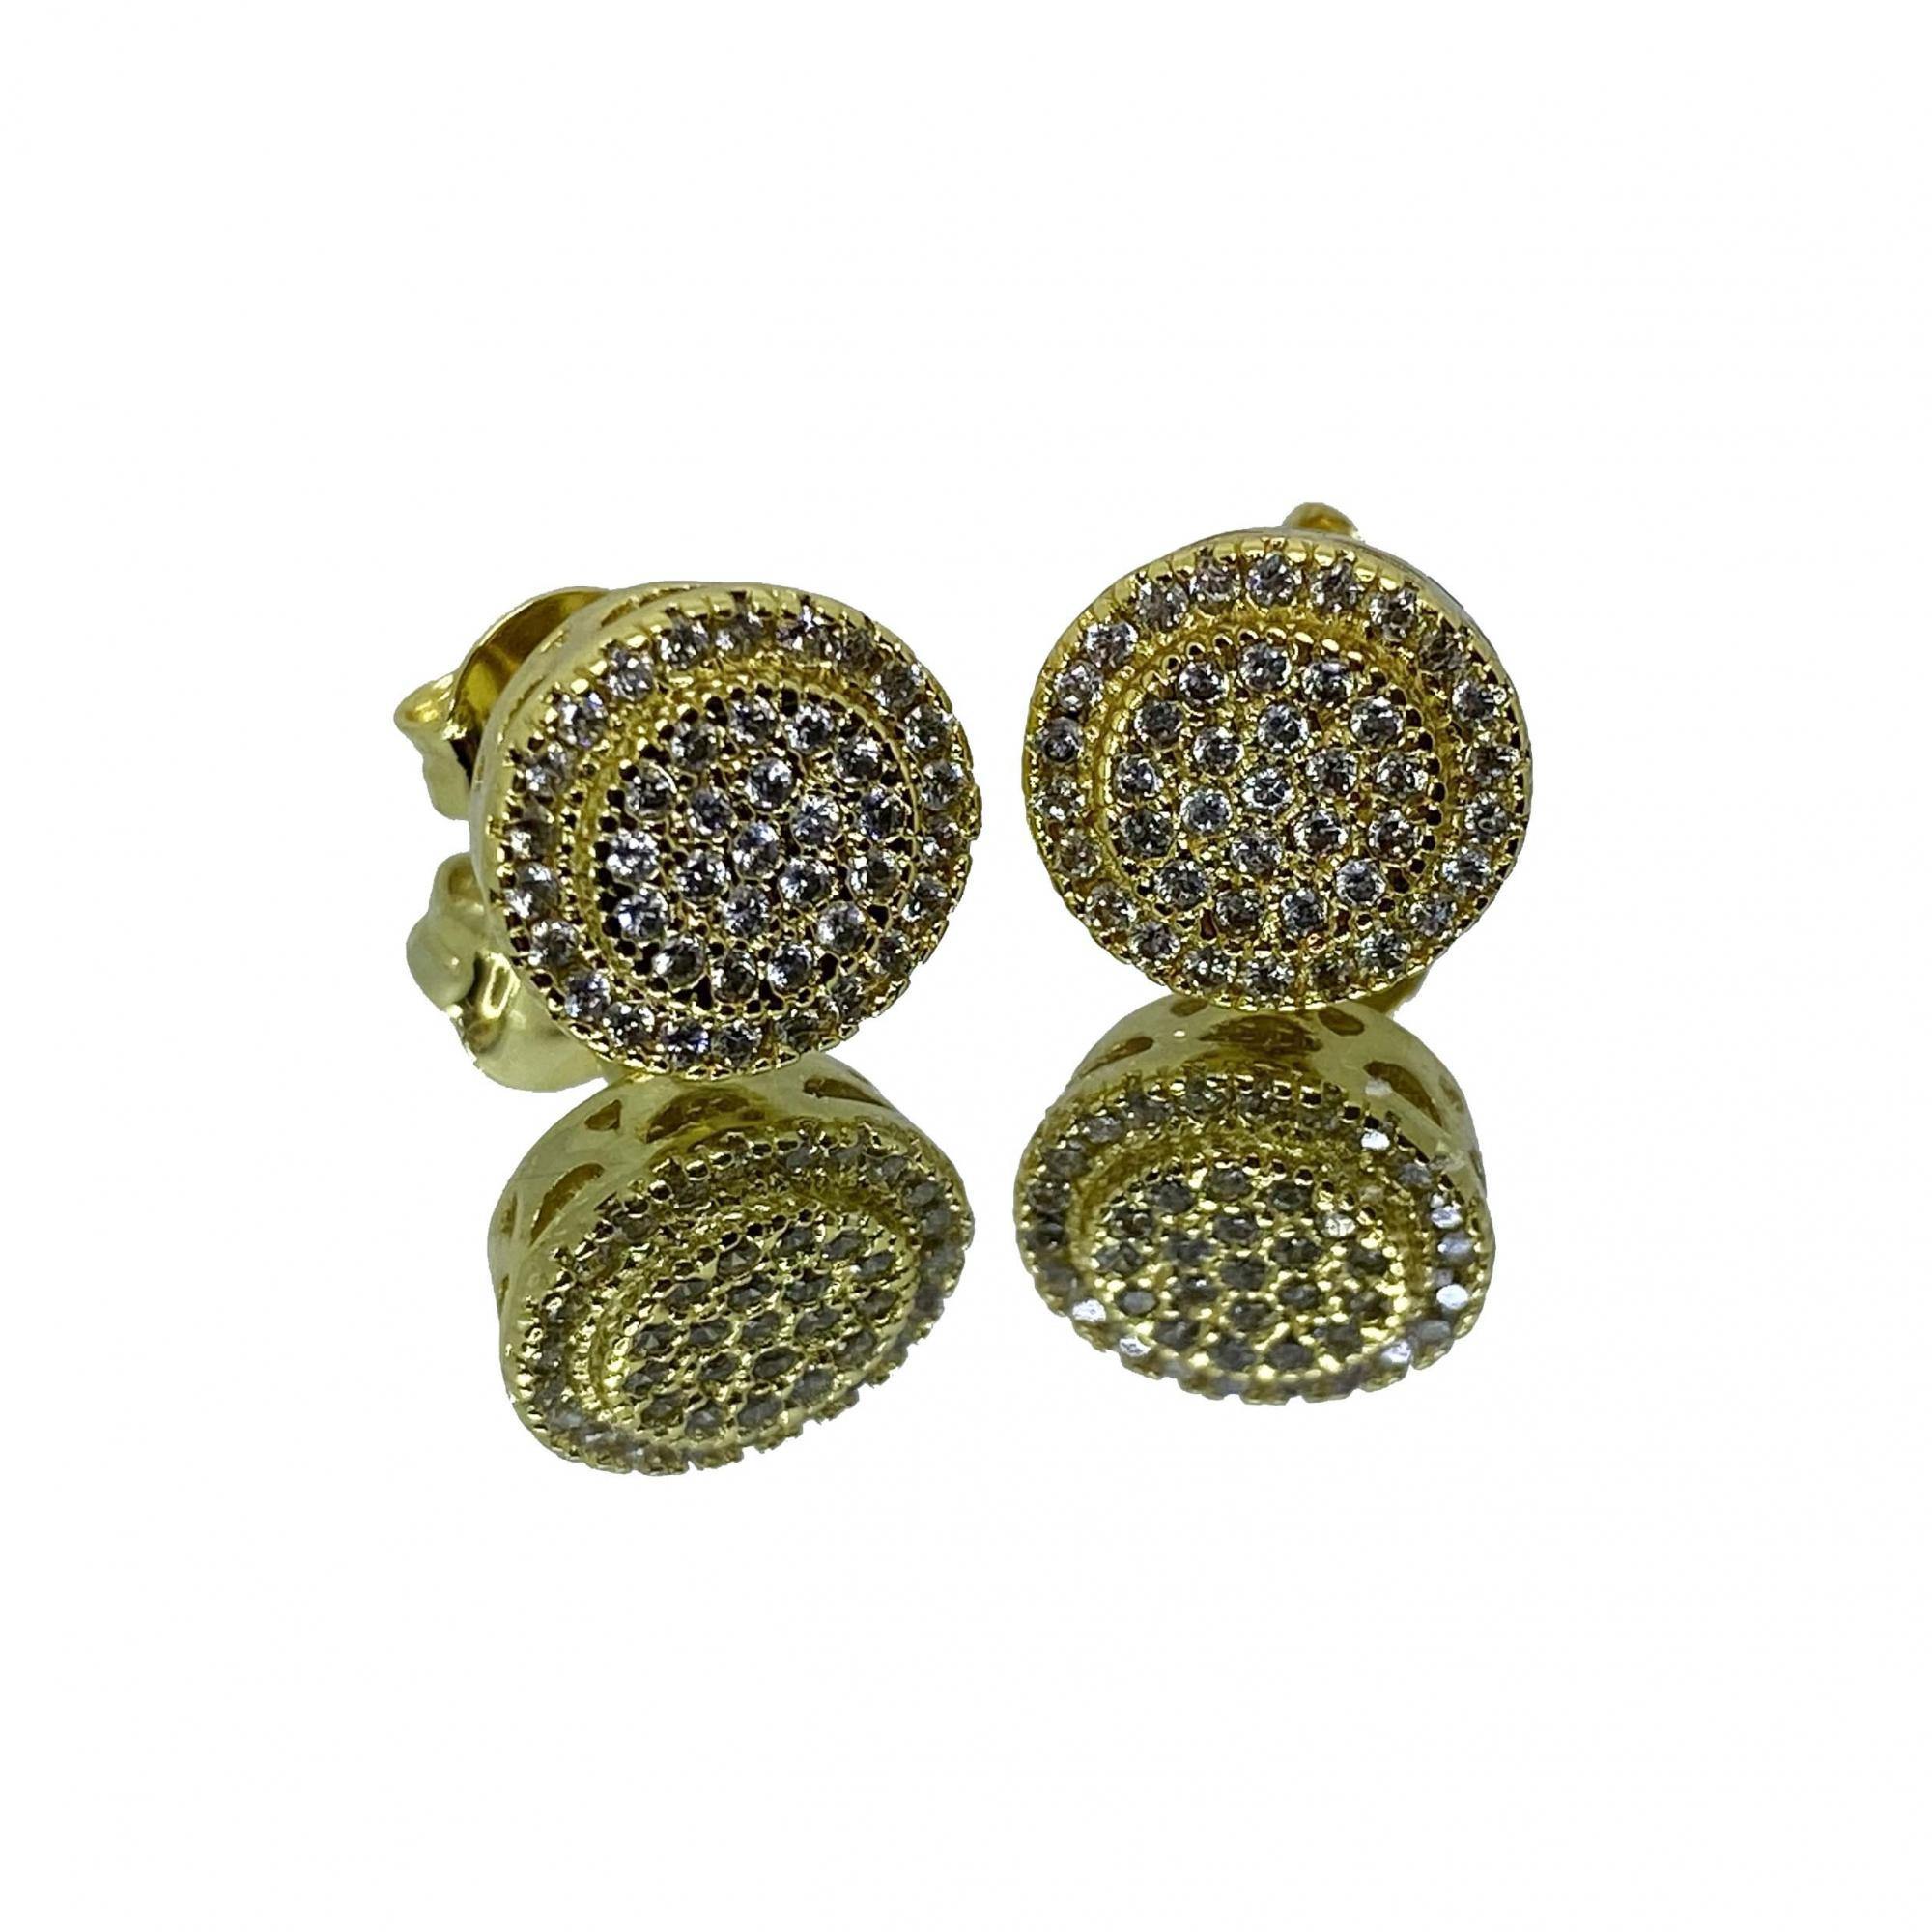 Brinco Circular 40 Pedras de Zircônia (2,6g) (Banho Ouro 18k)